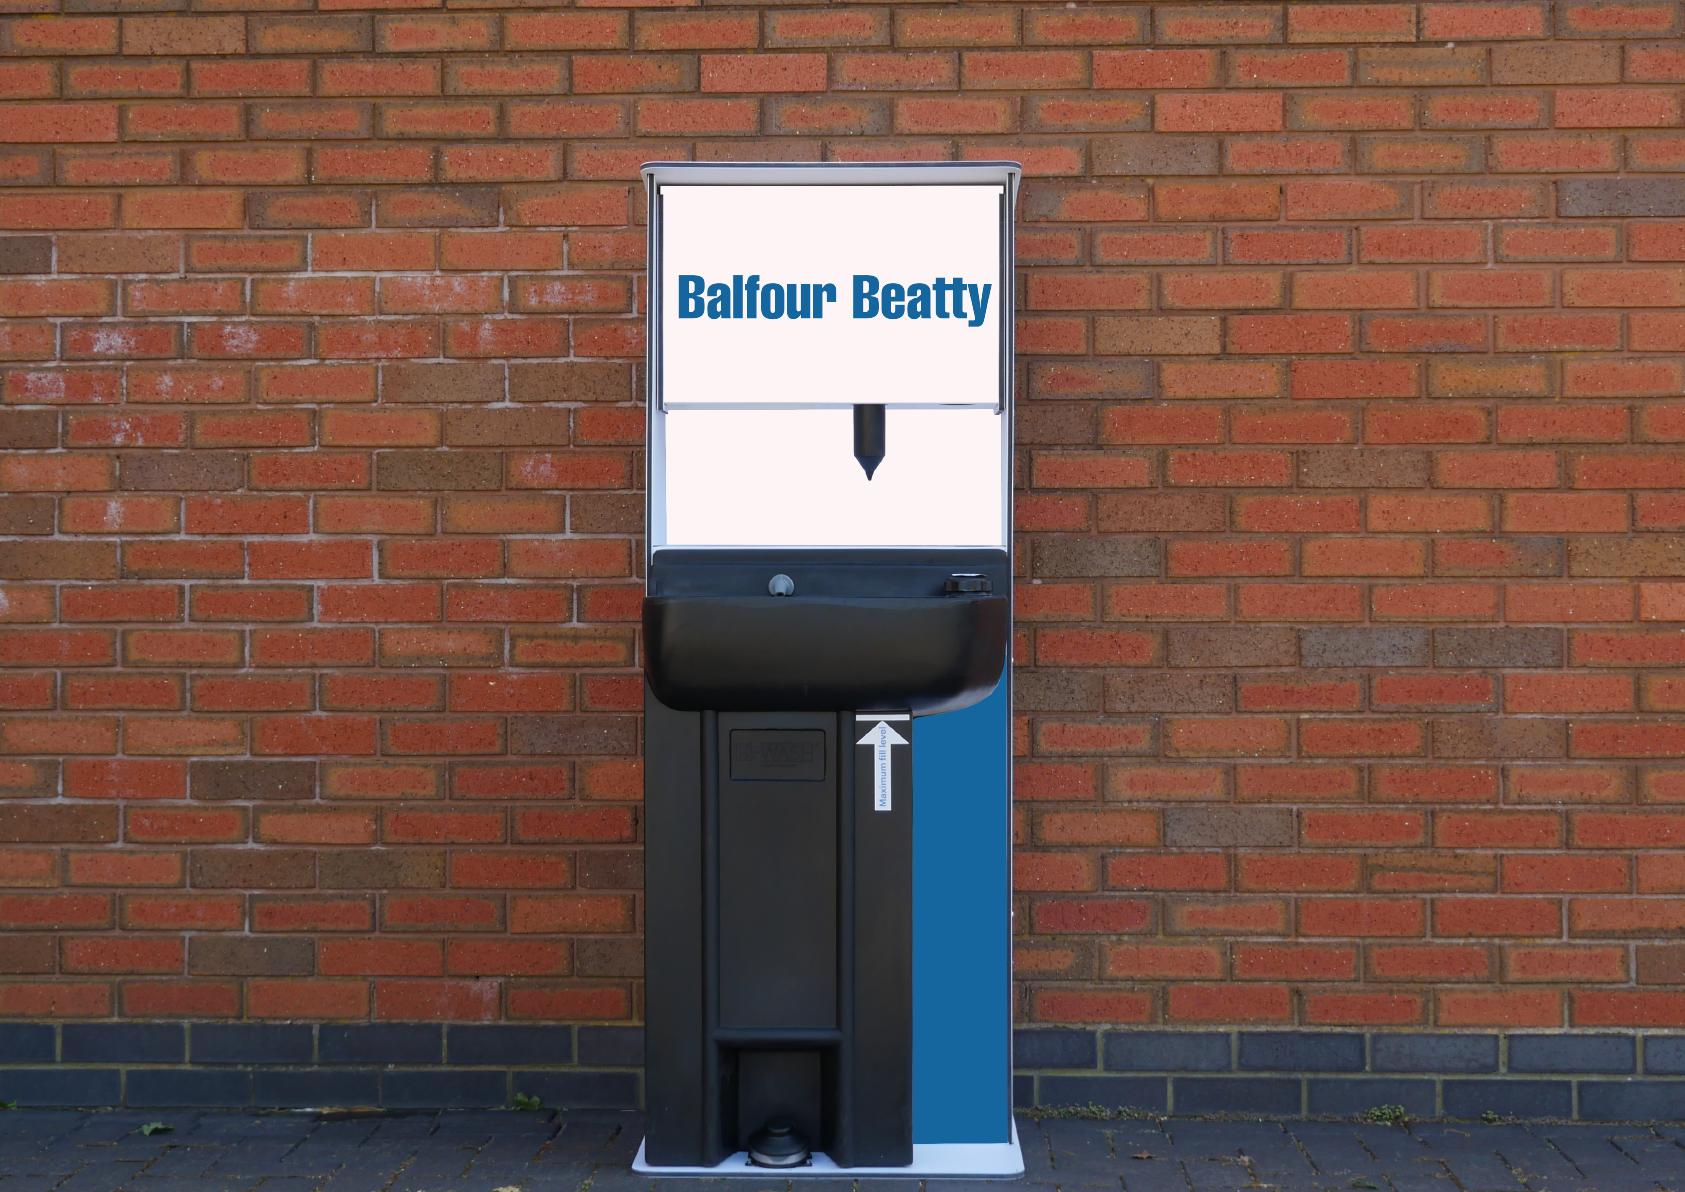 balfour beatty2